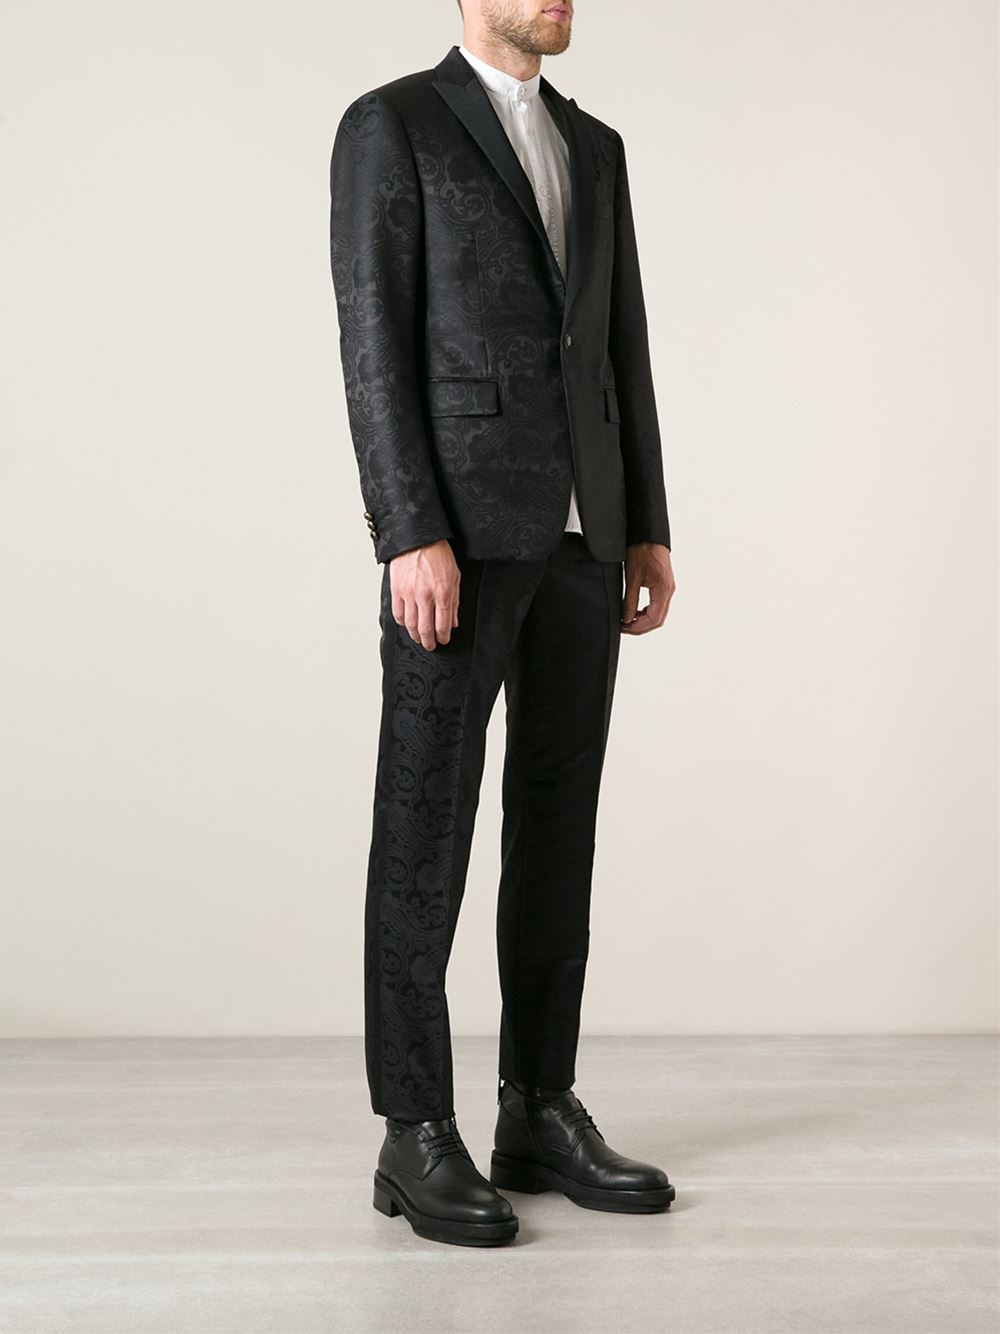 Lyst Etro Twopiece Baroque Suit In Black For Men